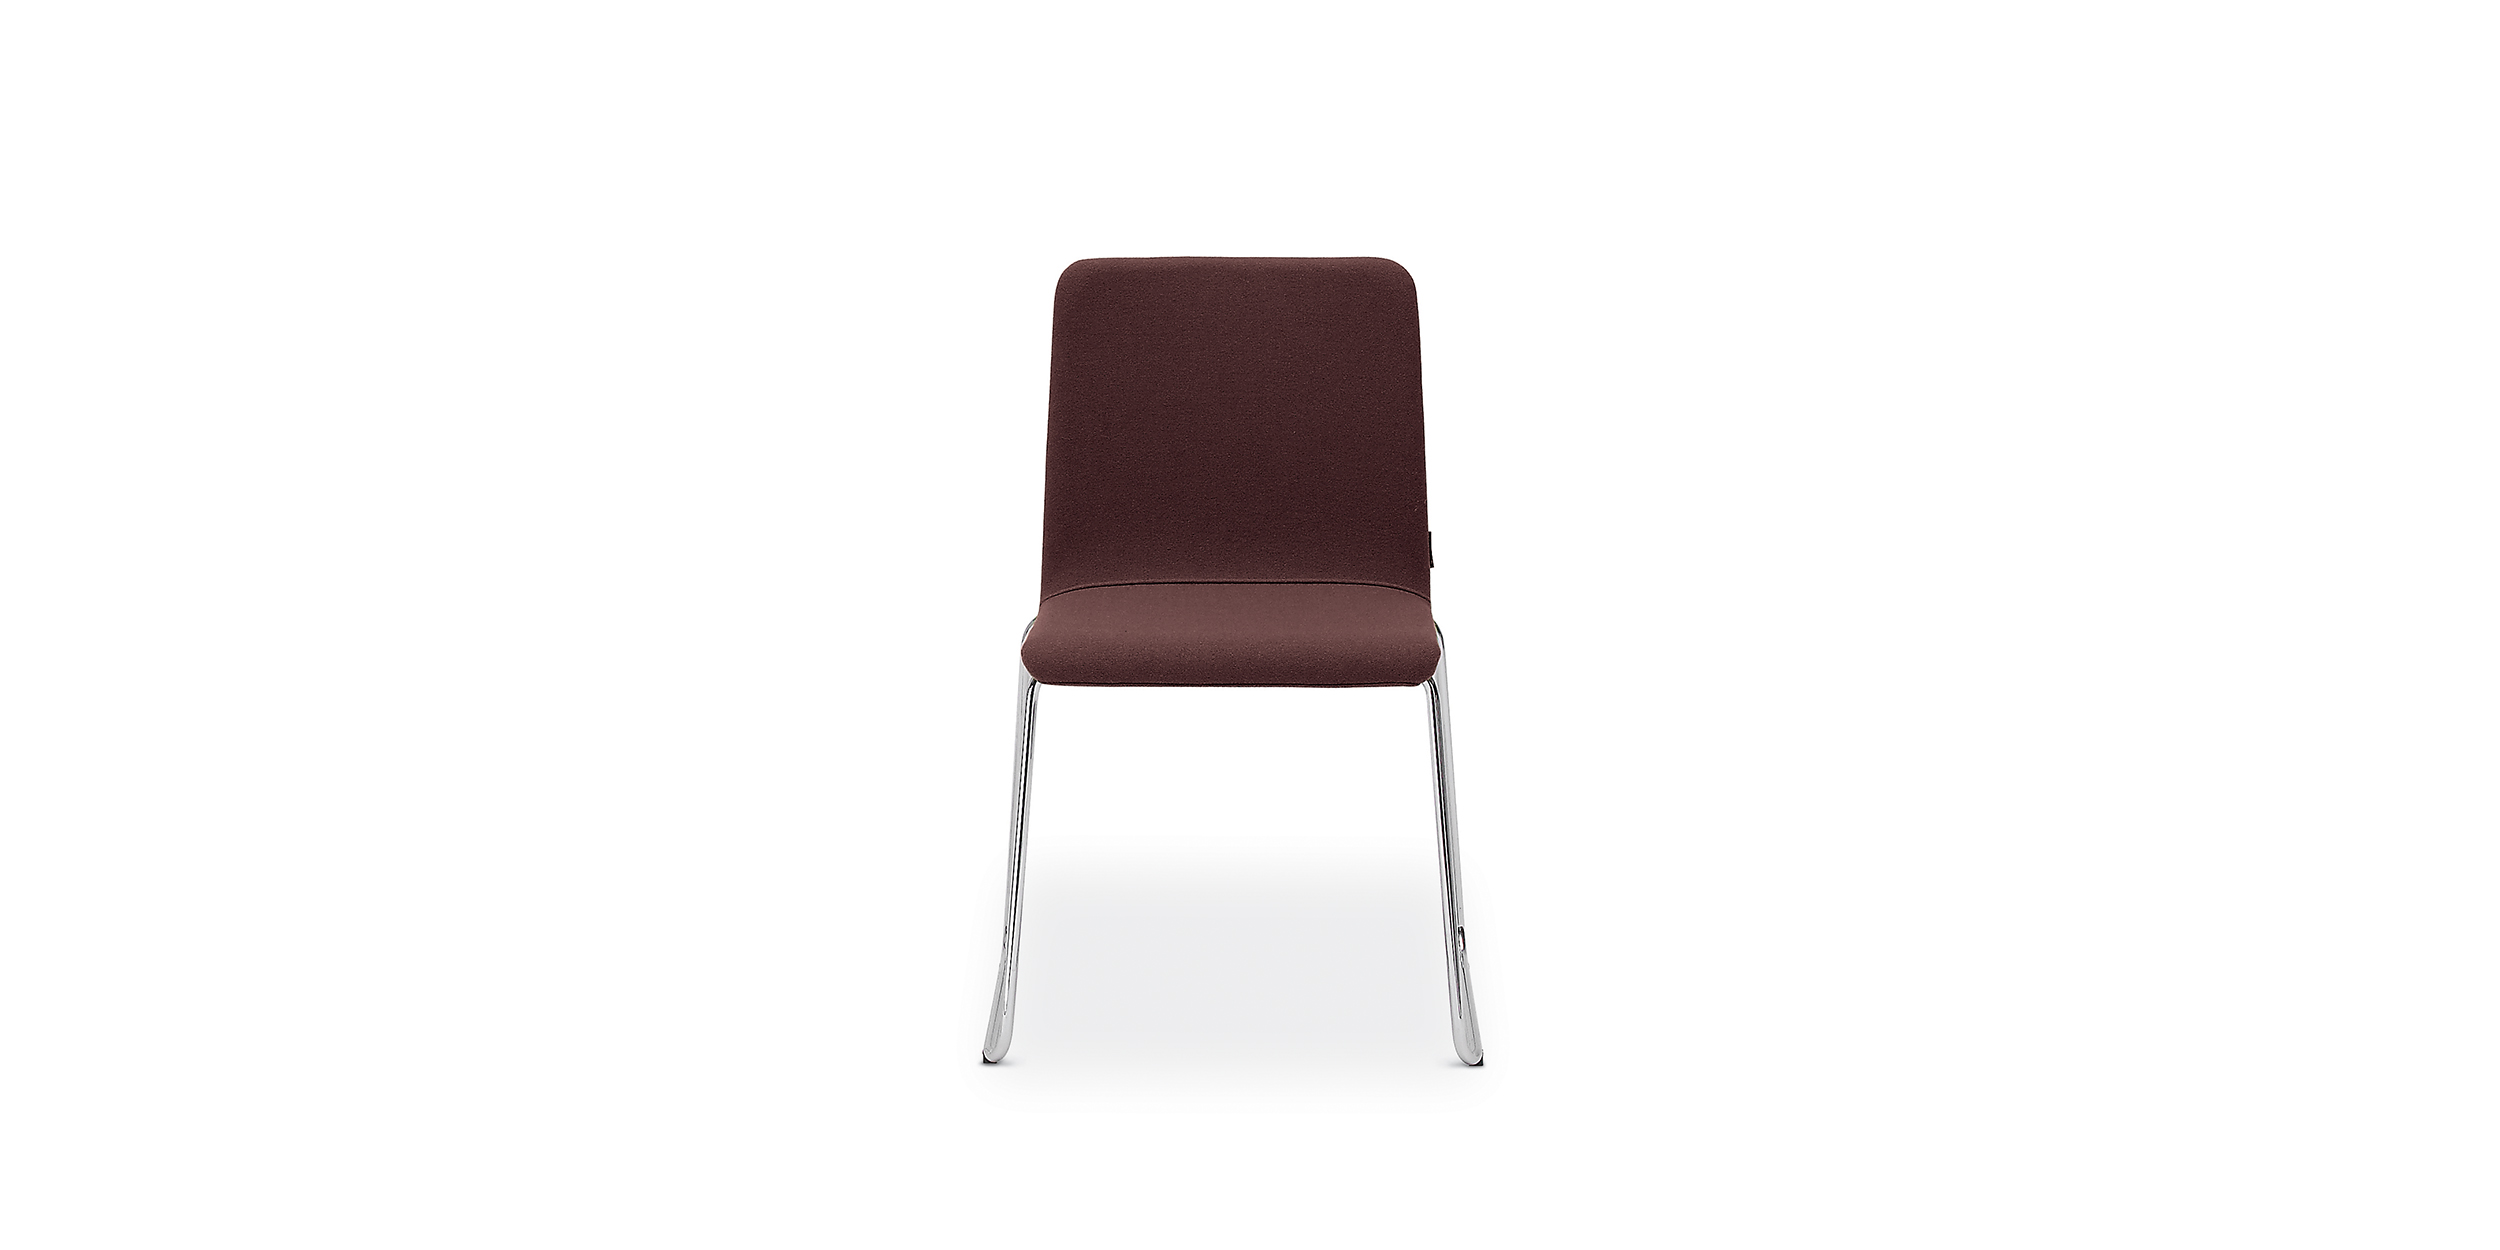 Mono Light, Stackable chair by Claesson Koivisto Rune